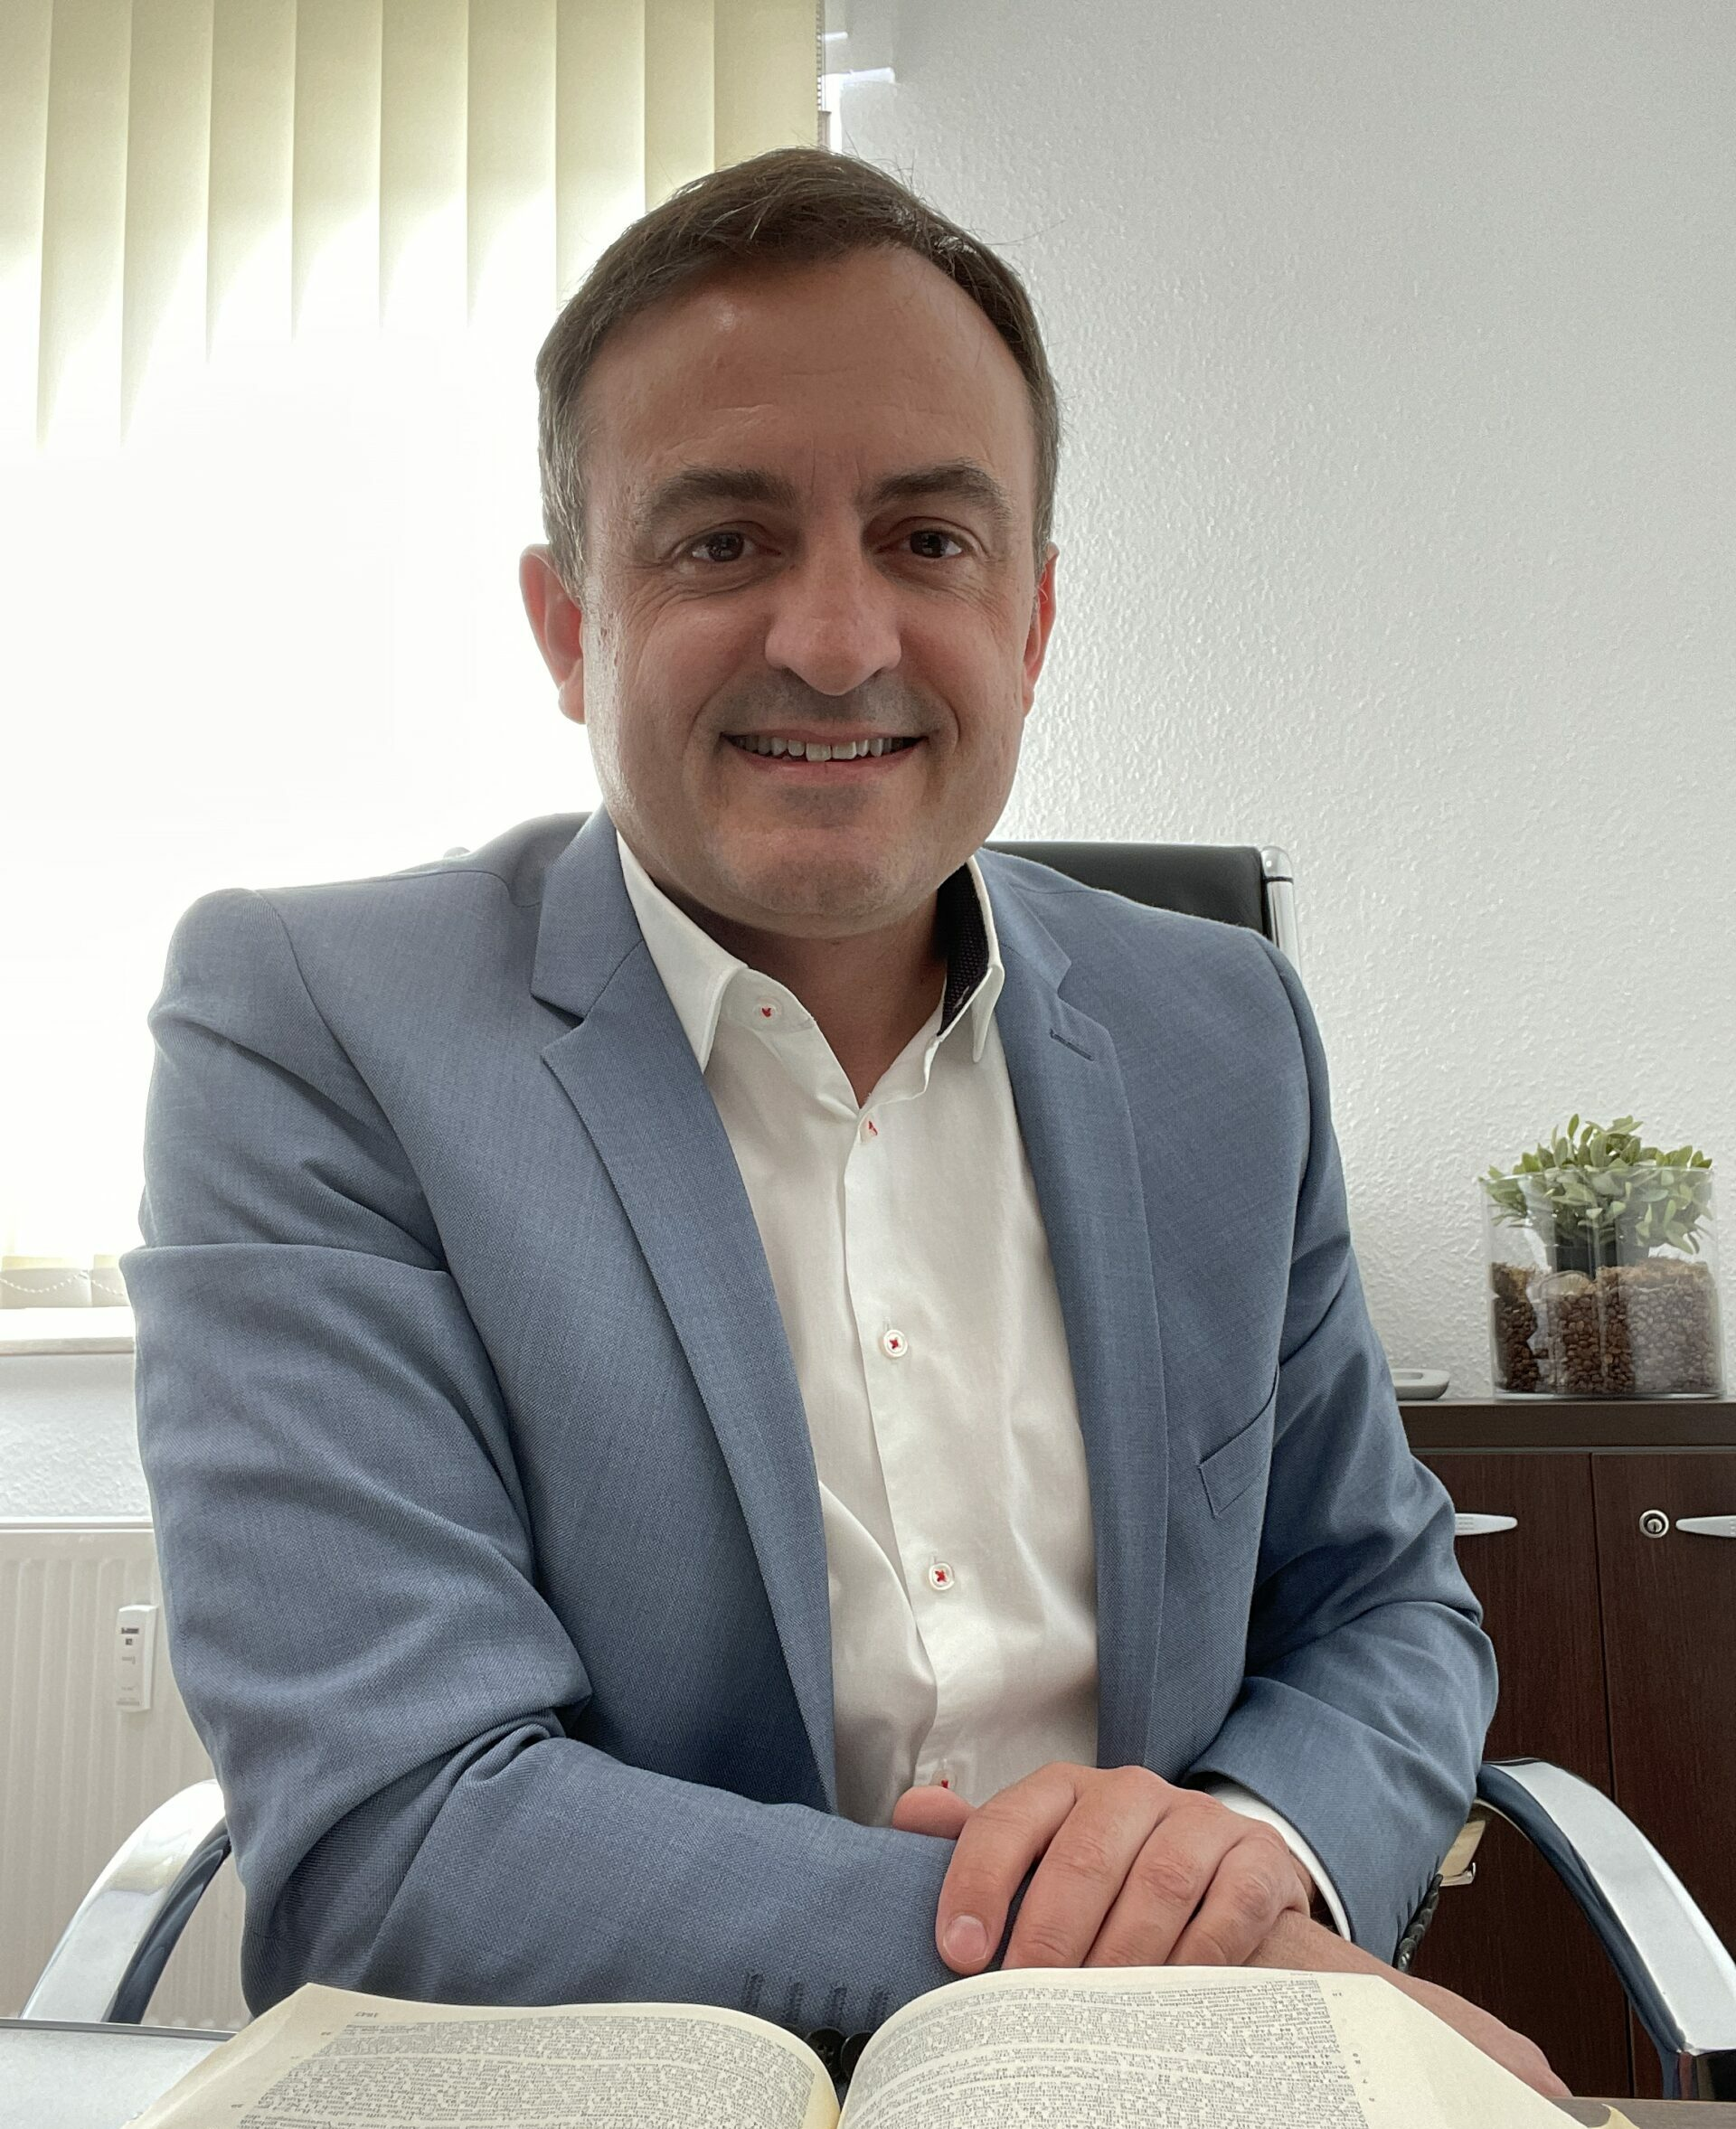 Rechtsanwalt Nils Finkeldei